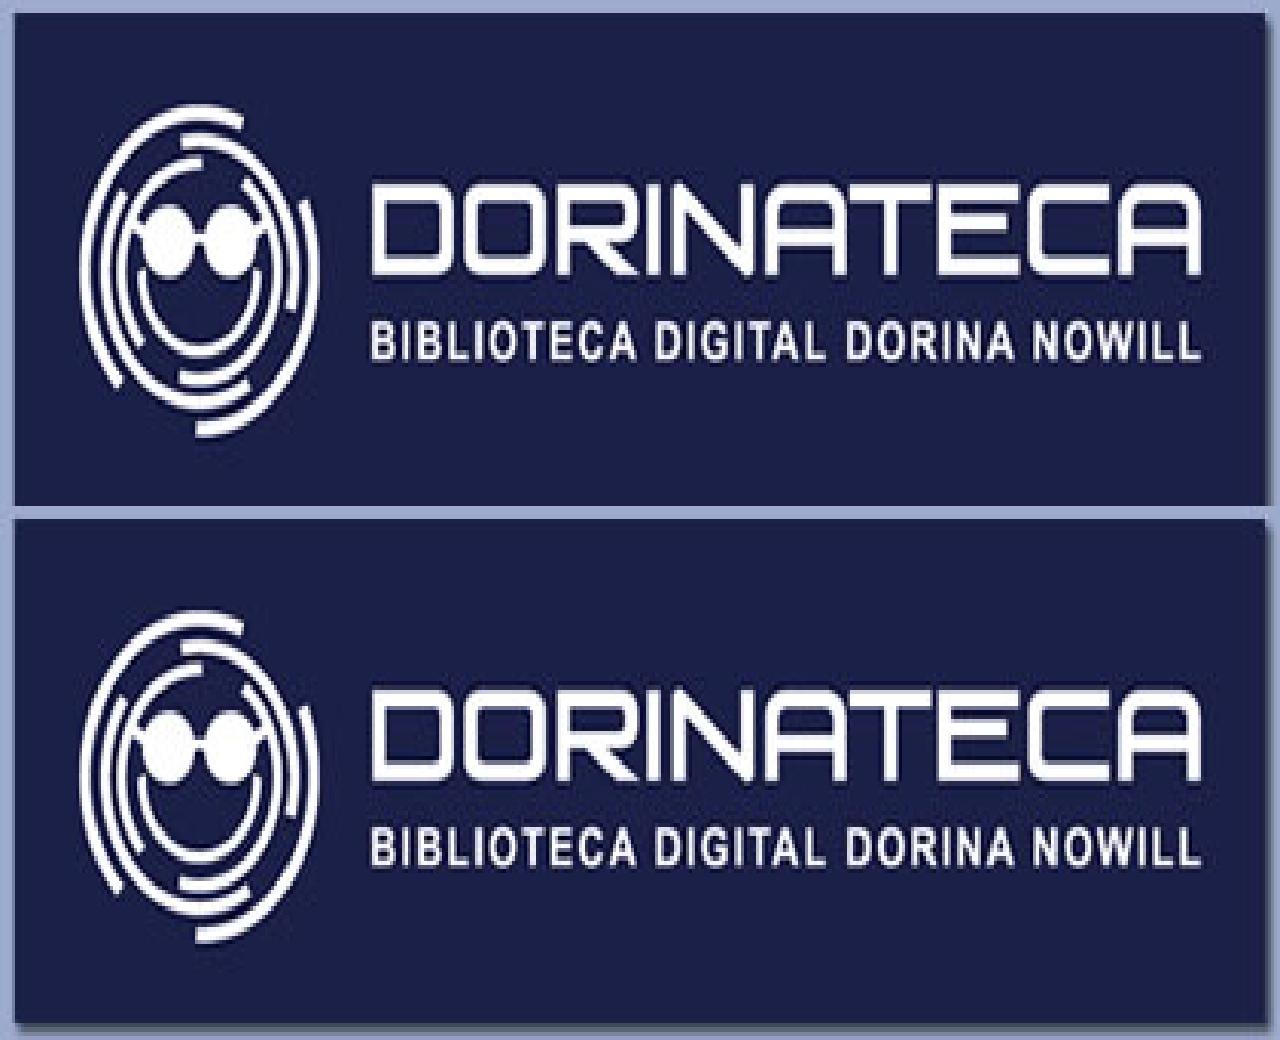 dorinatec.jpg